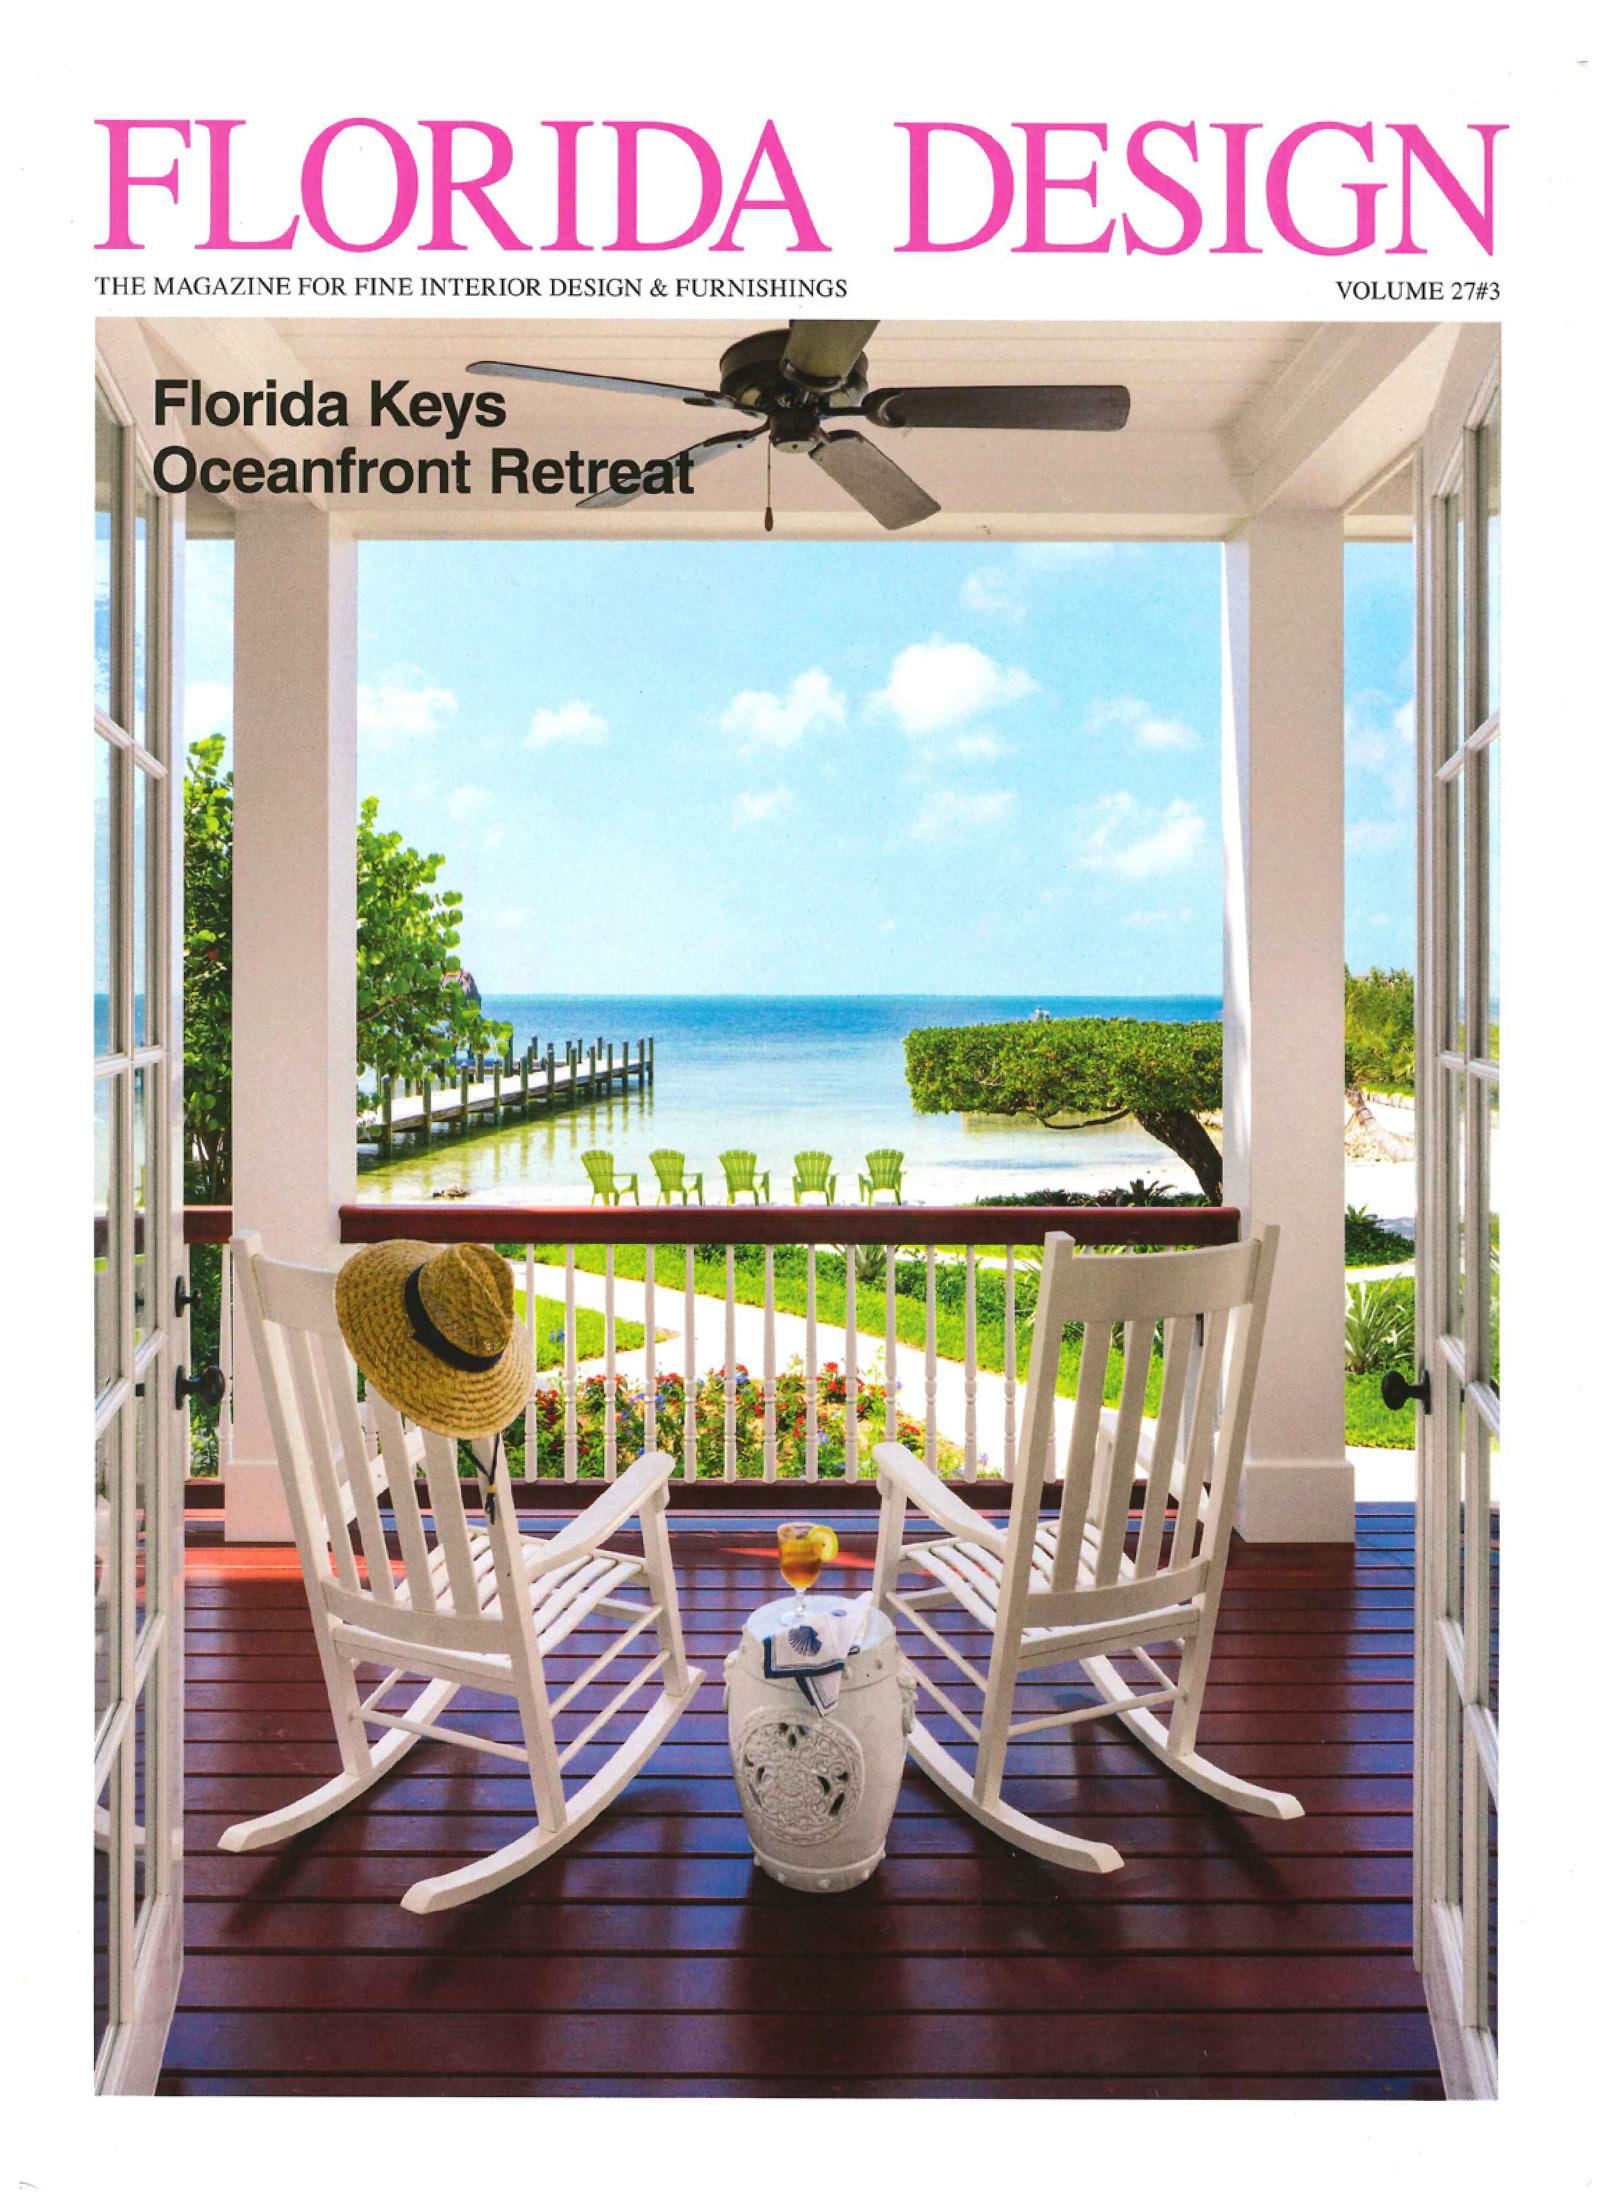 Florida Design, Fall 2017